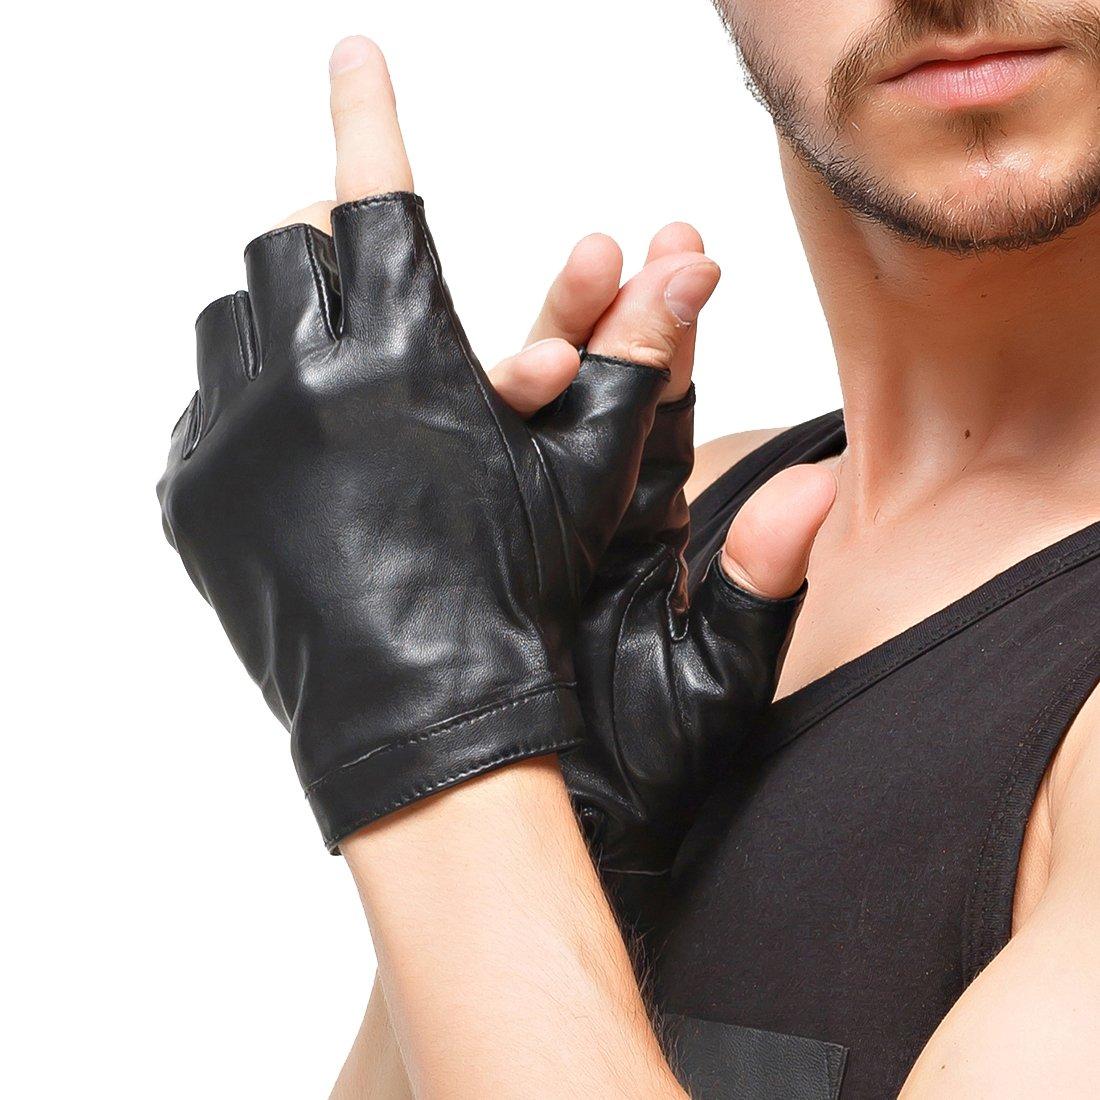 Men Fingerless Gloves - Nappaglo Lambskin Leather Half Finger Driving Outdoor DCE2151NB3PH